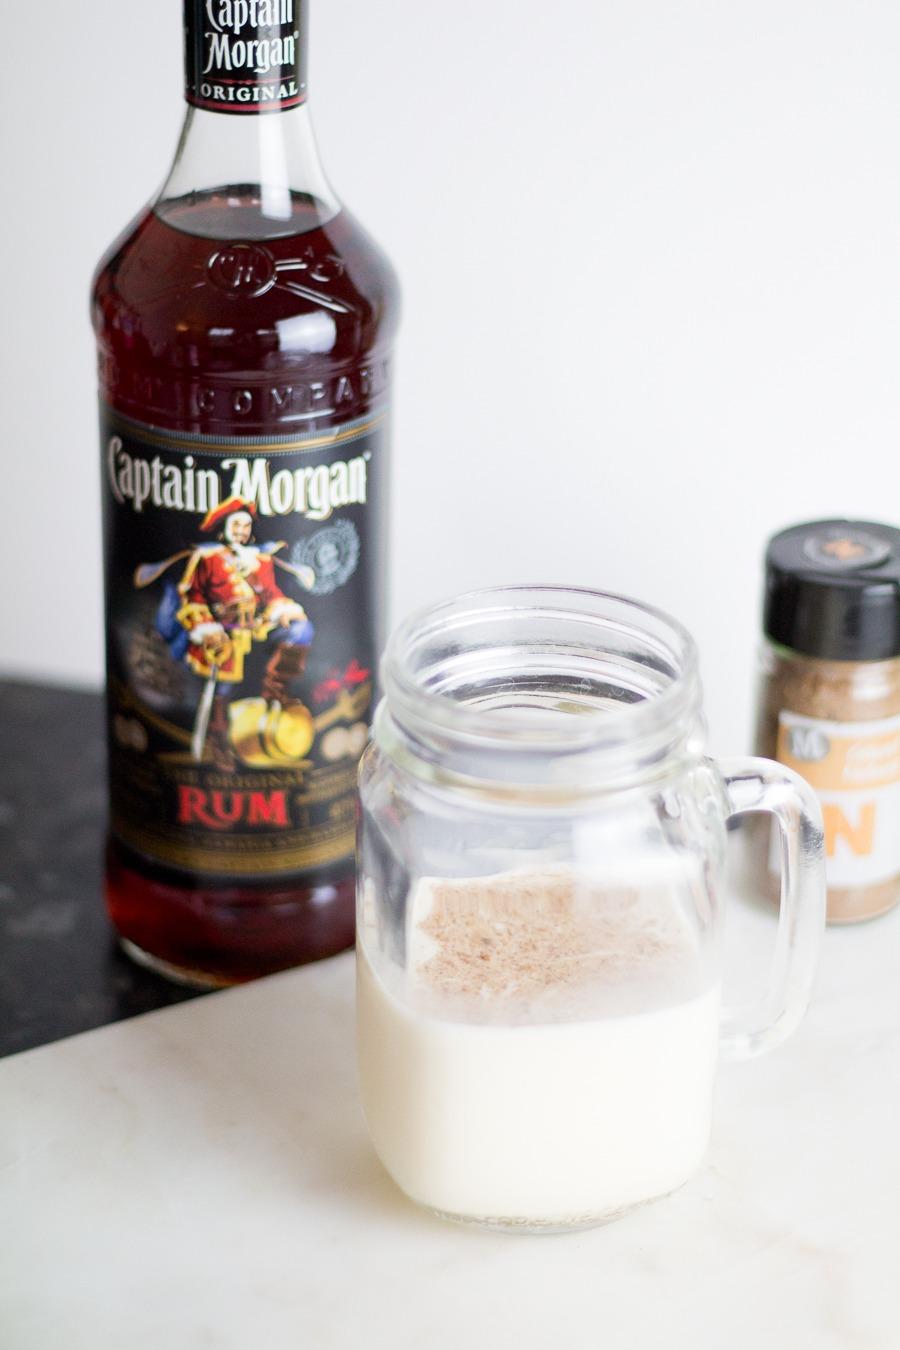 Captain Morgan easy eggnog cocktail